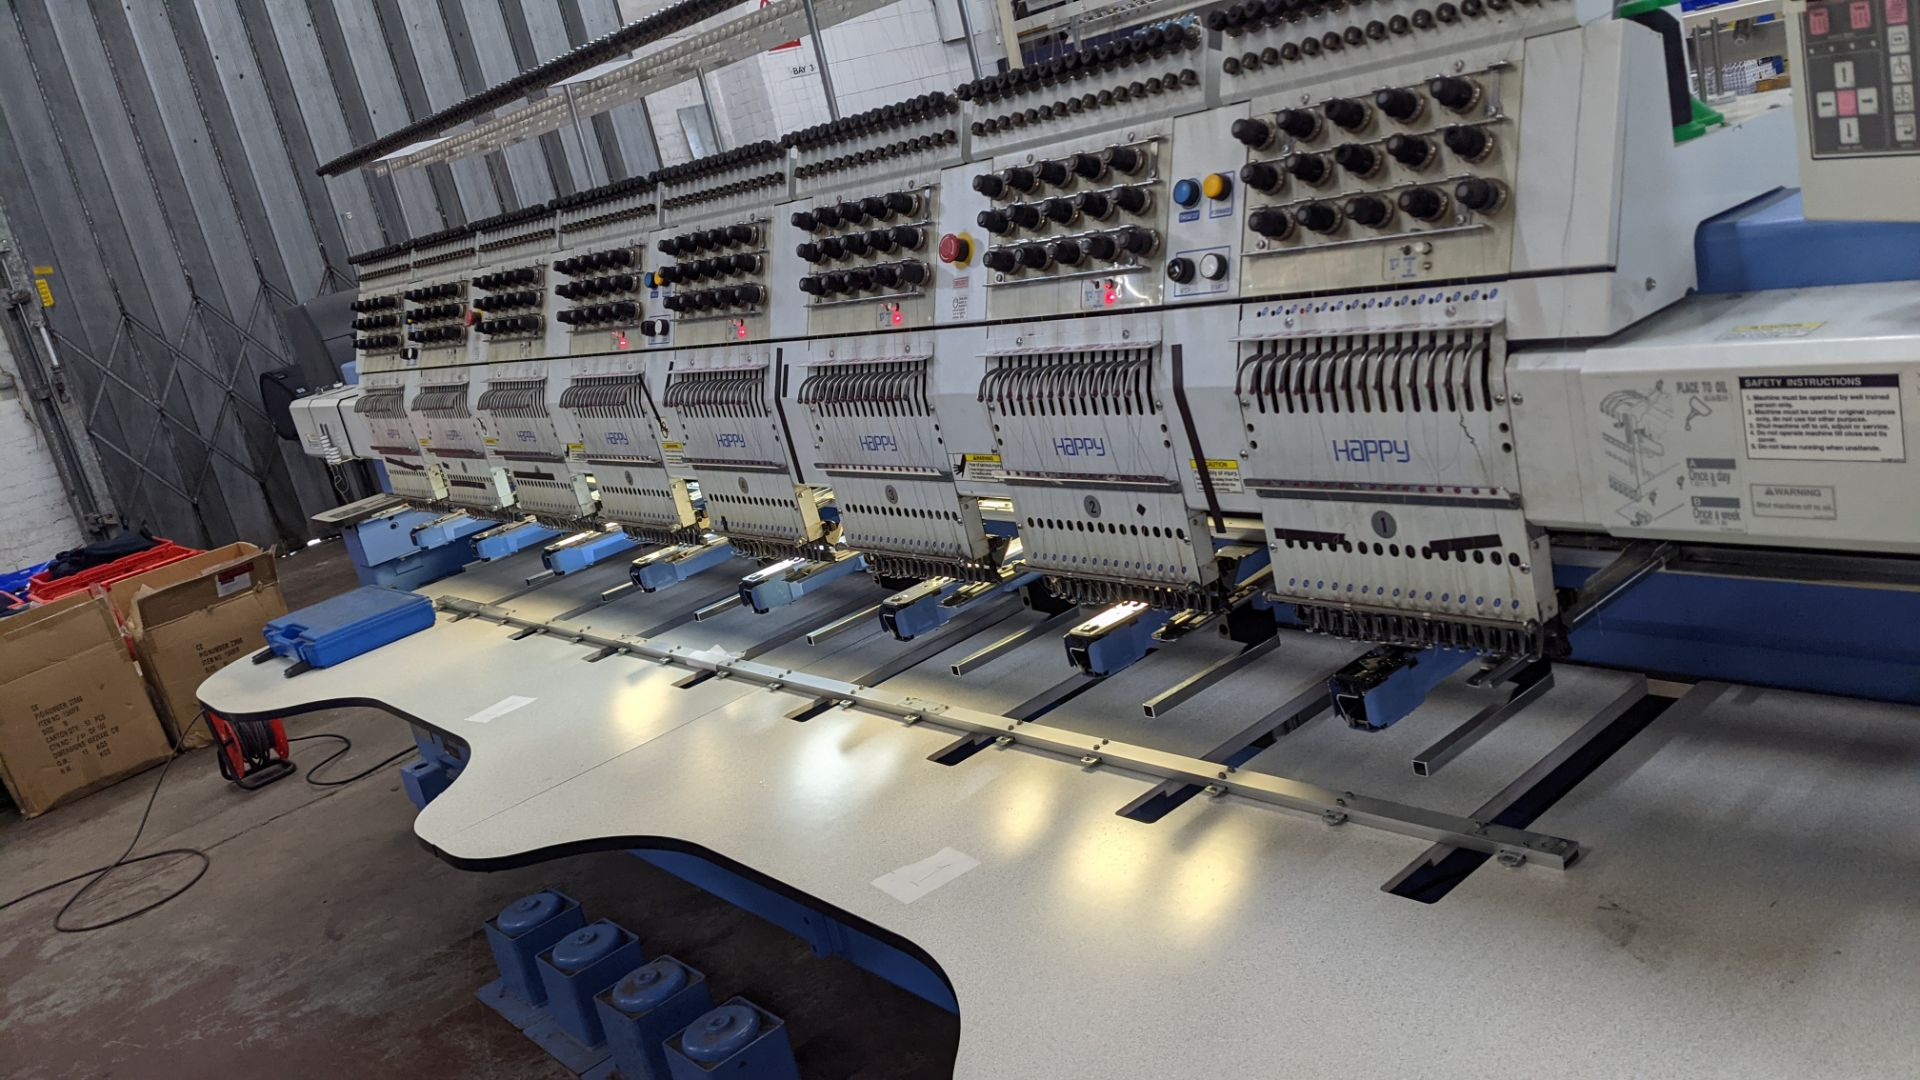 Happy 8 head embroidery machine, model HCG-1508B-45TTC, 15 needles per head, including frames & othe - Image 12 of 32